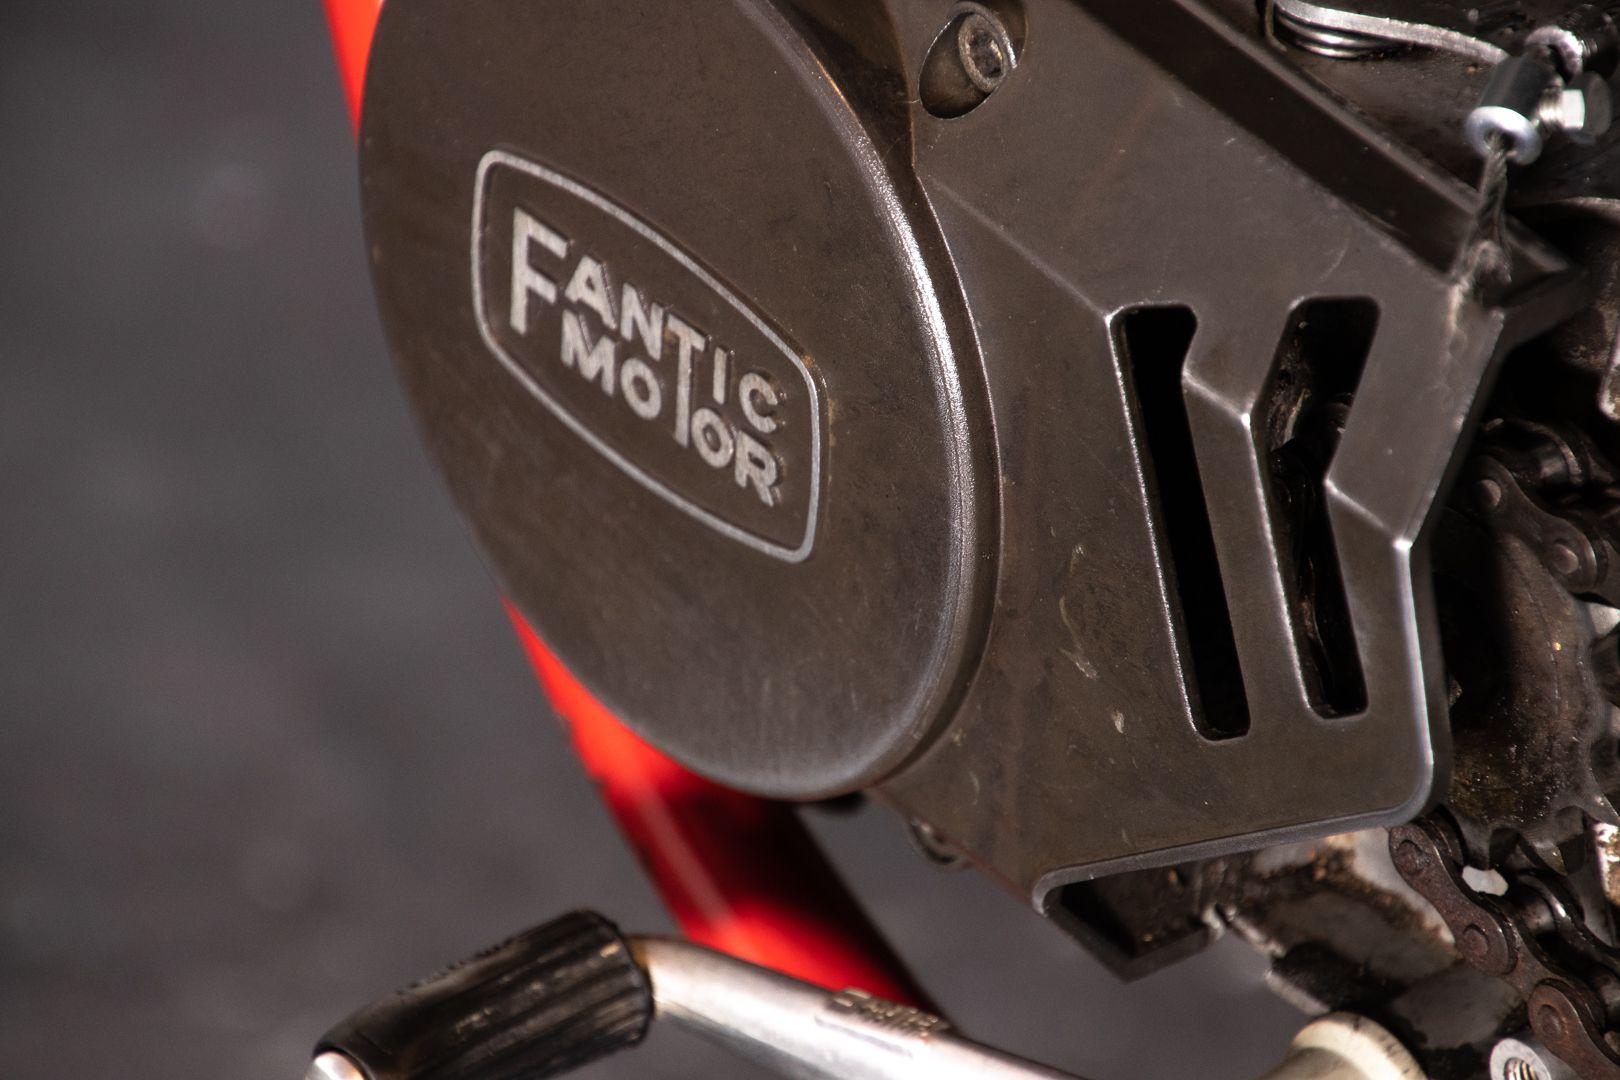 2000 FANTIC MOTOR TX 190 48875